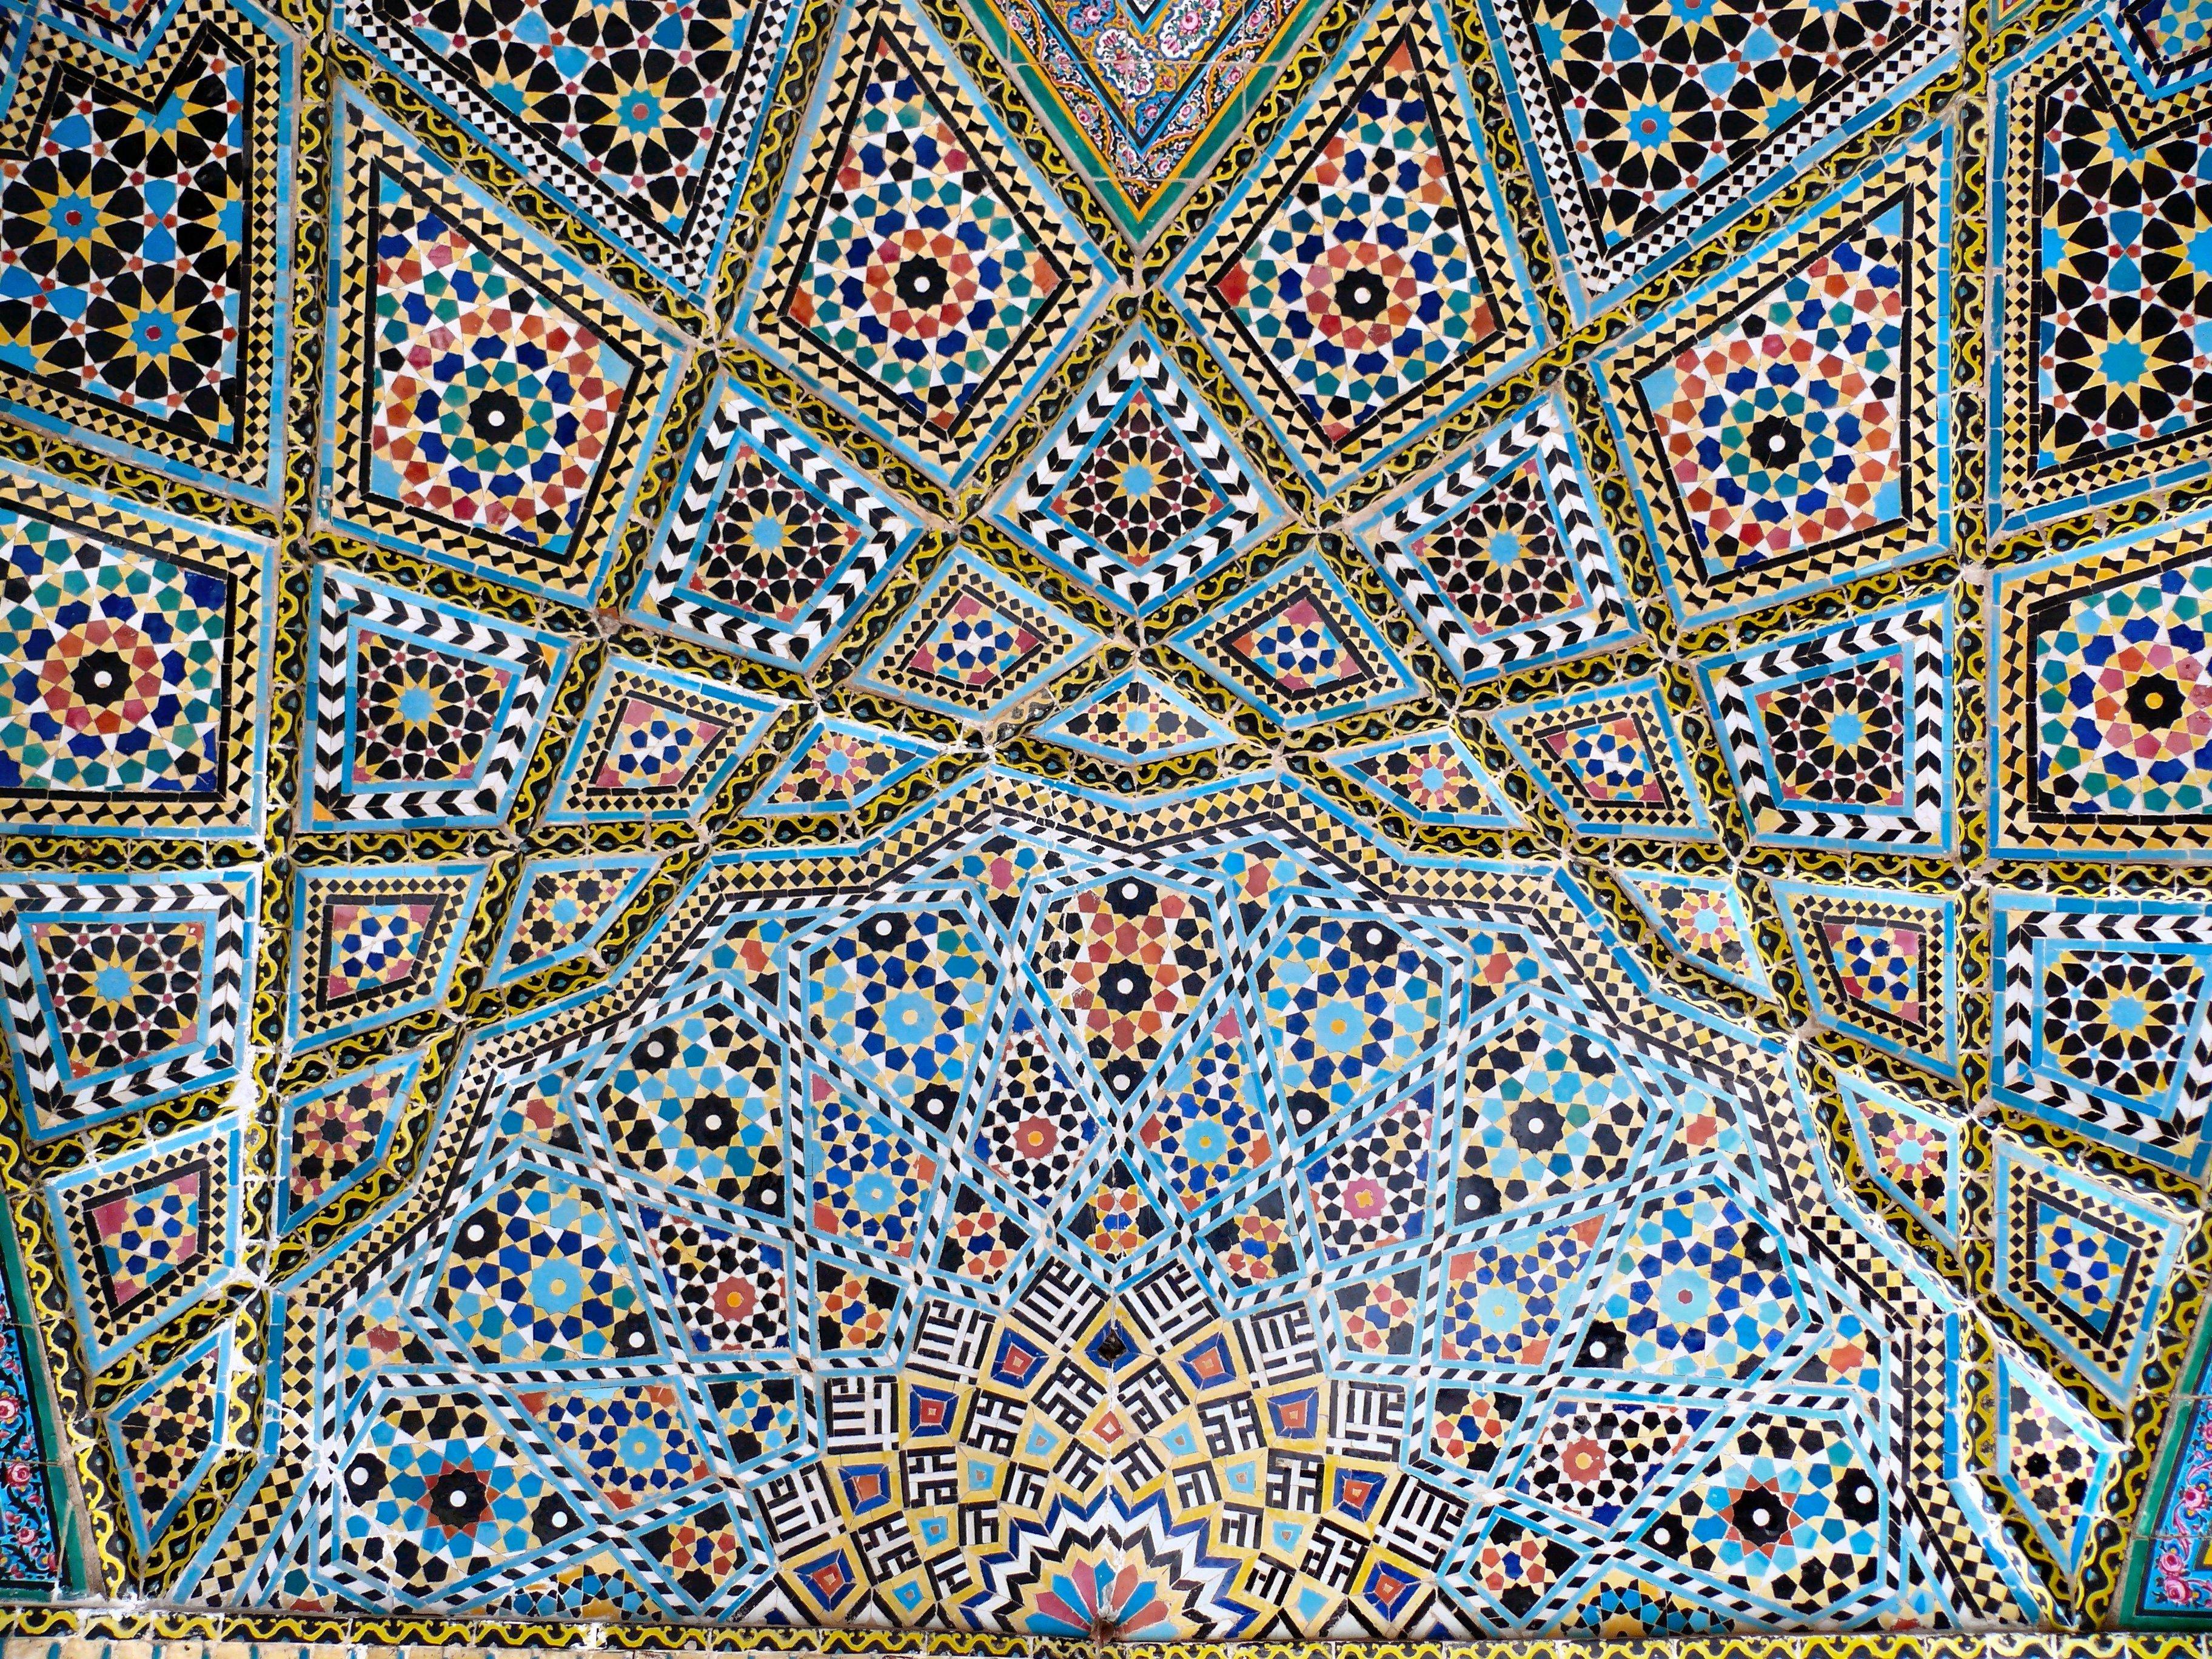 http://en.academic.ru/pictures/enwiki/78/Nasr_ol_Molk_mosque_vault_ceiling_2.jpg